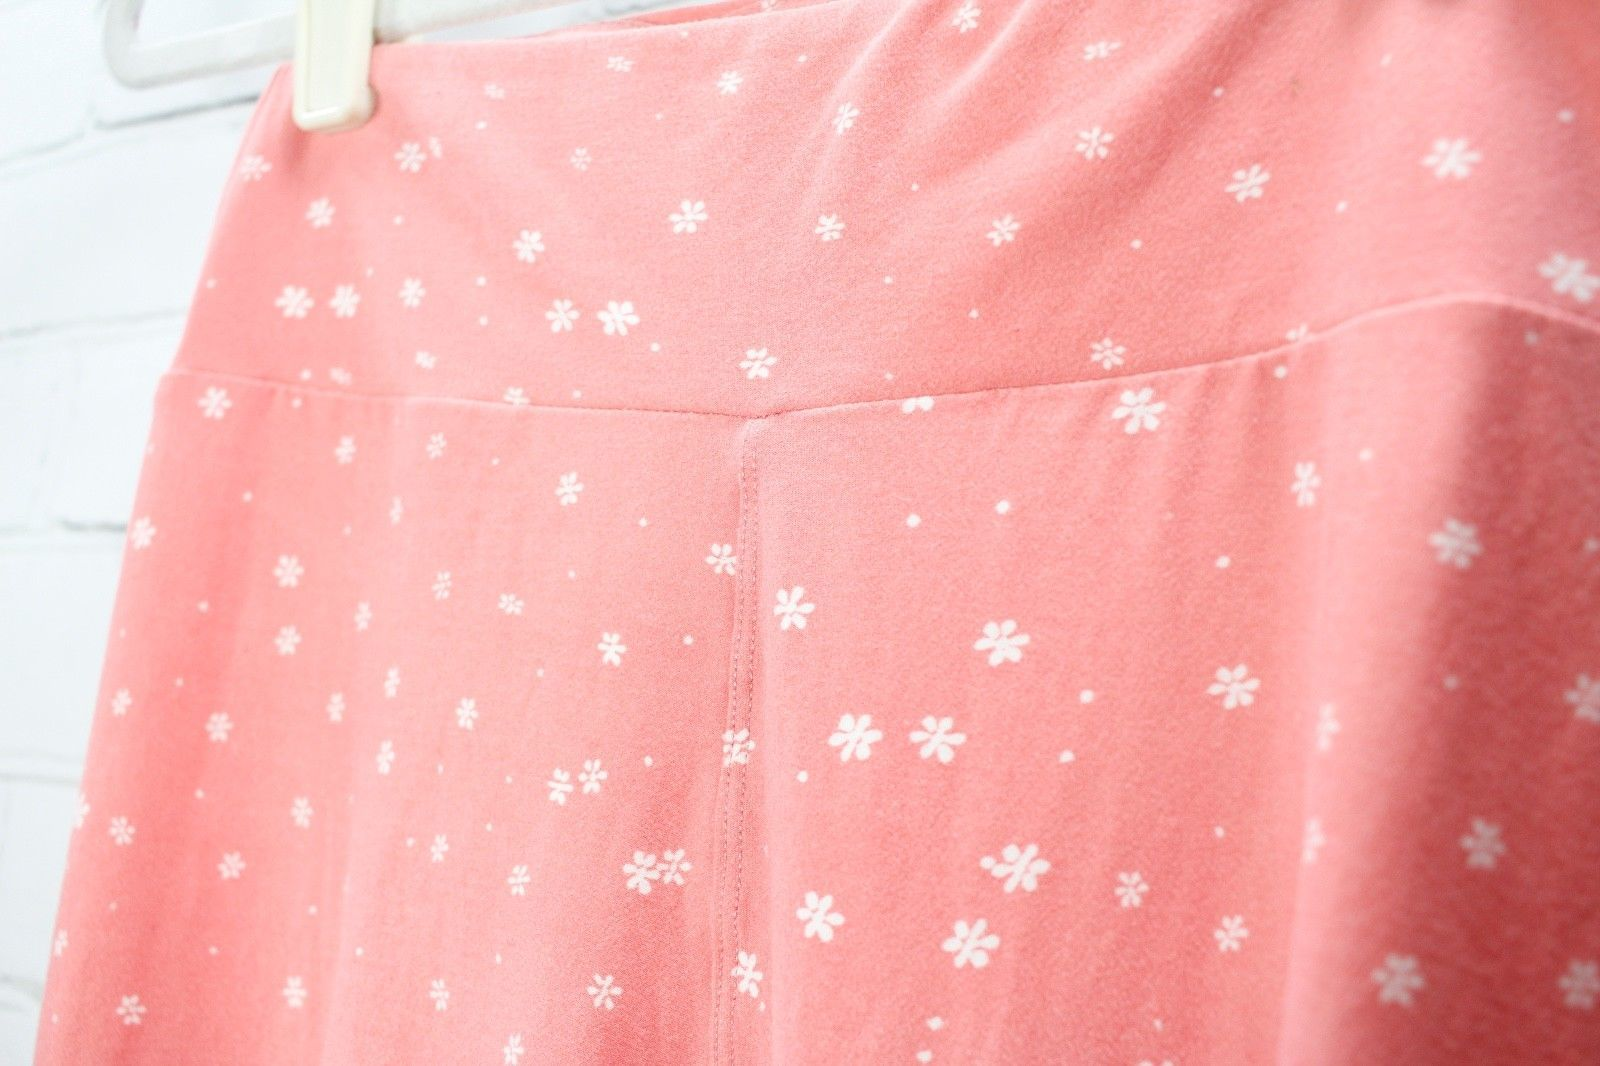 LULAROE Leggings Pink Floral Print OS One Size - Lot of 2 image 8